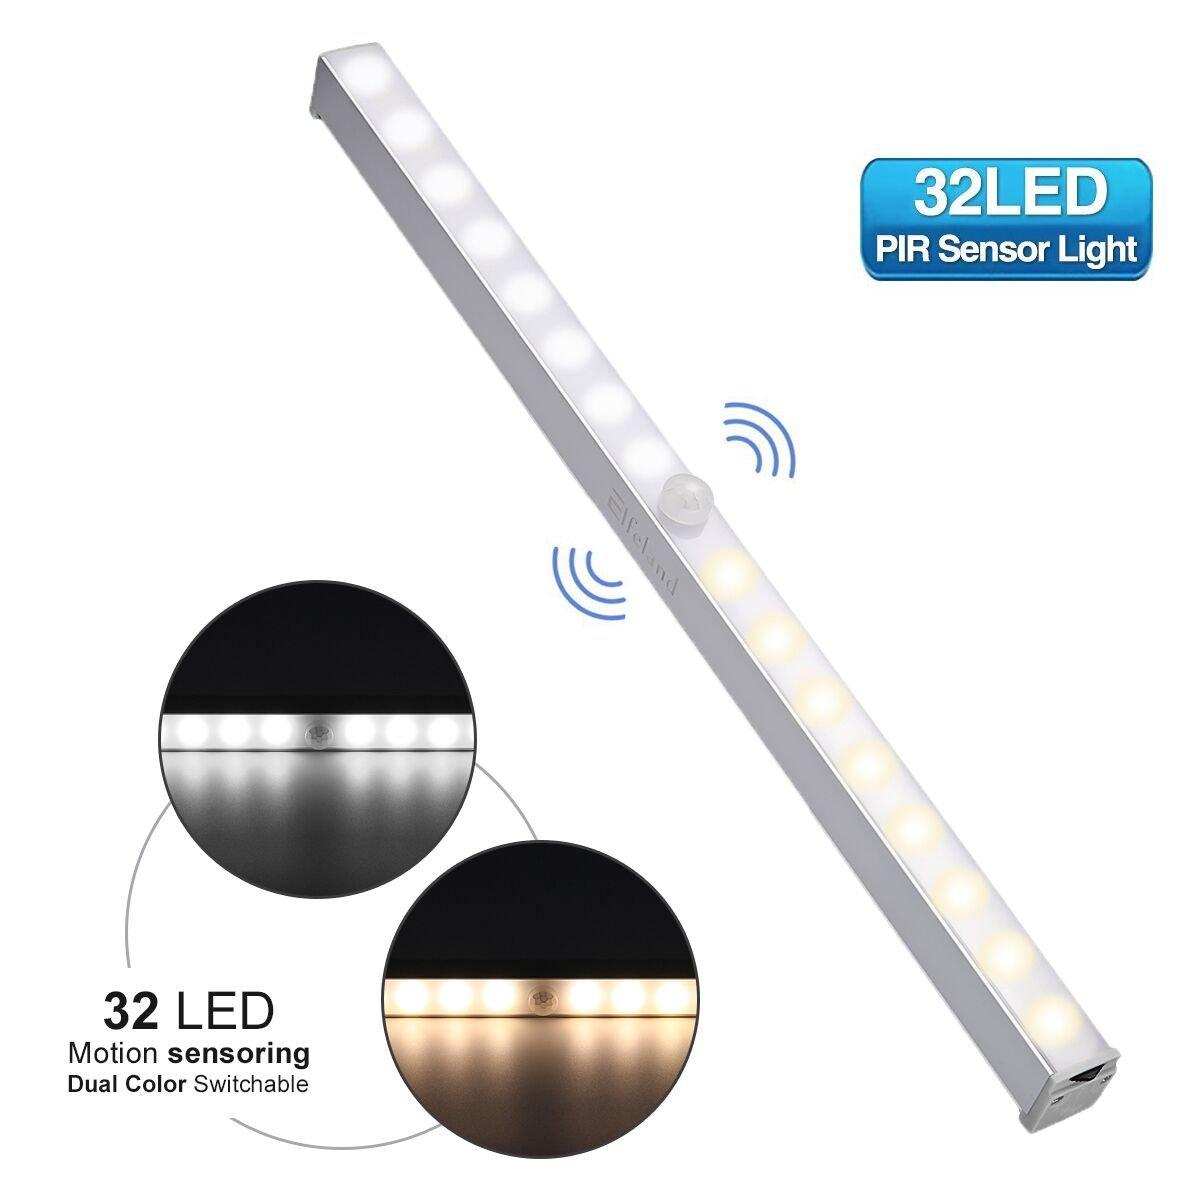 LED Under Cabinet Lighting Elfeland 32 LED Motion Sensor Closet light Stick-on Anywhere Night Light Magnetic/Screws Wireless Battery Powered Cabinet lights for Kitchen Closet Cupboard (3000 K/6000 K)